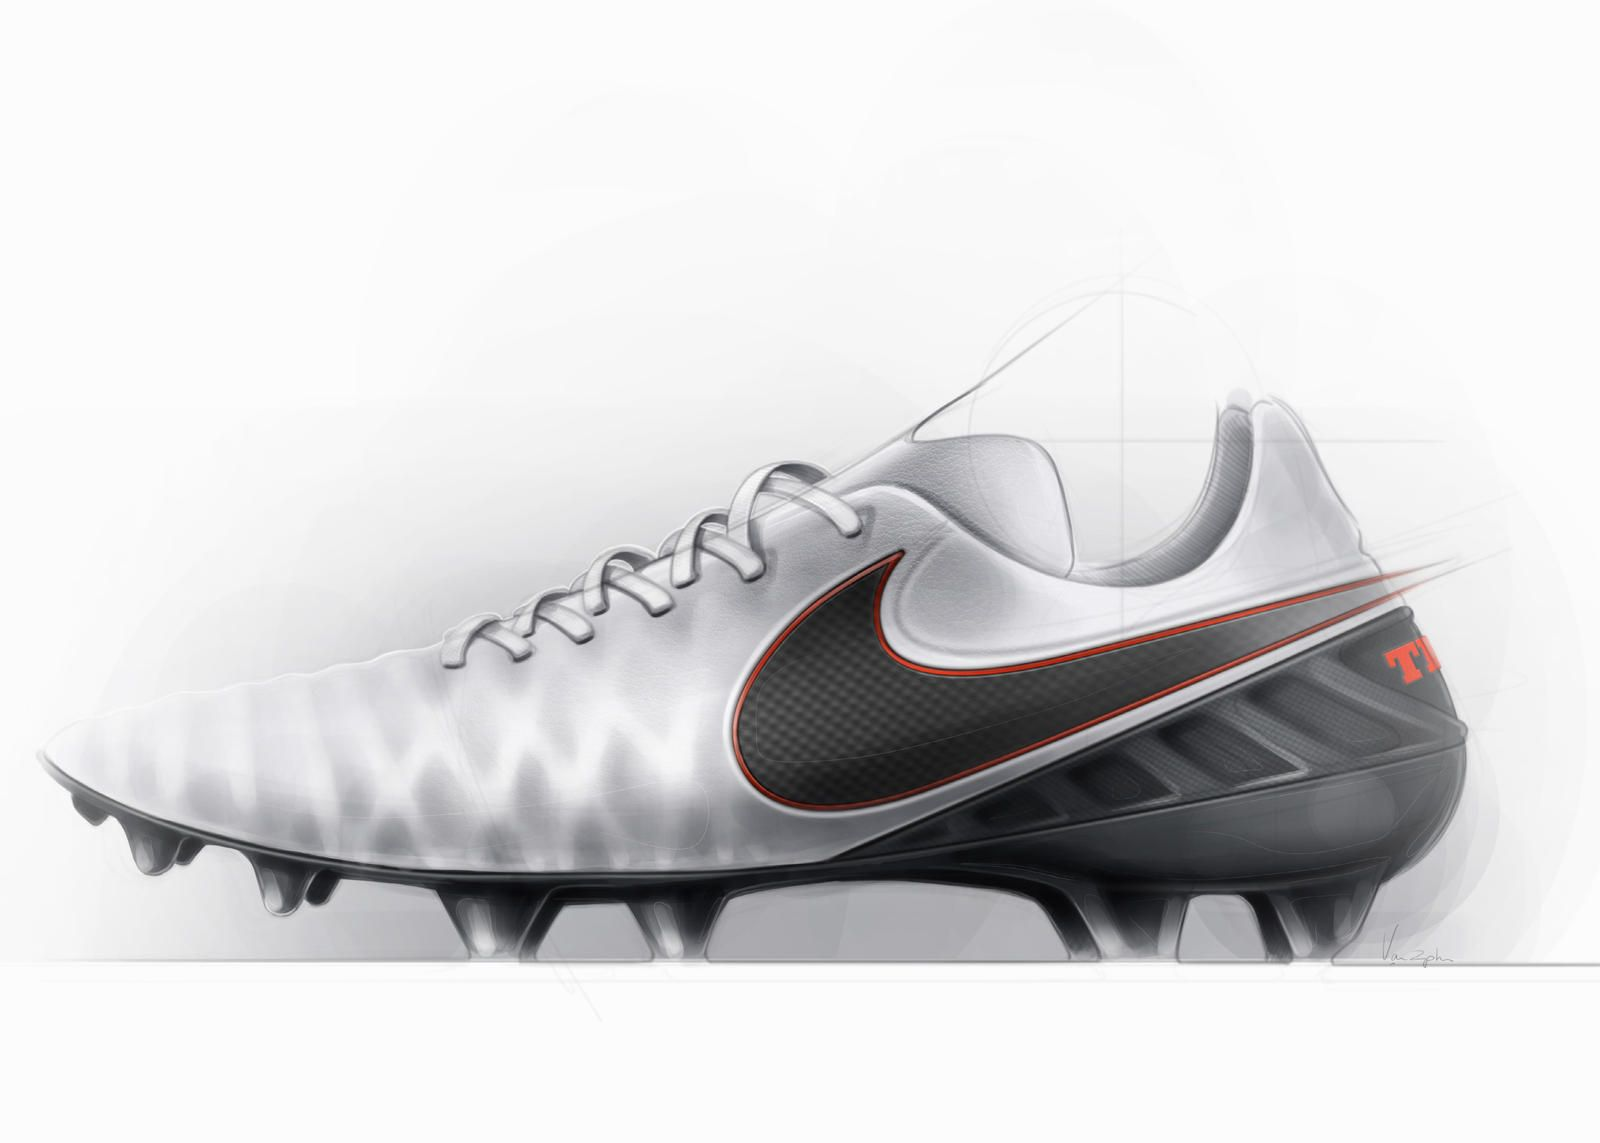 Tiempo Legend 6 Shoe Design Sketches Industrial Design Trends Latest Football Boots